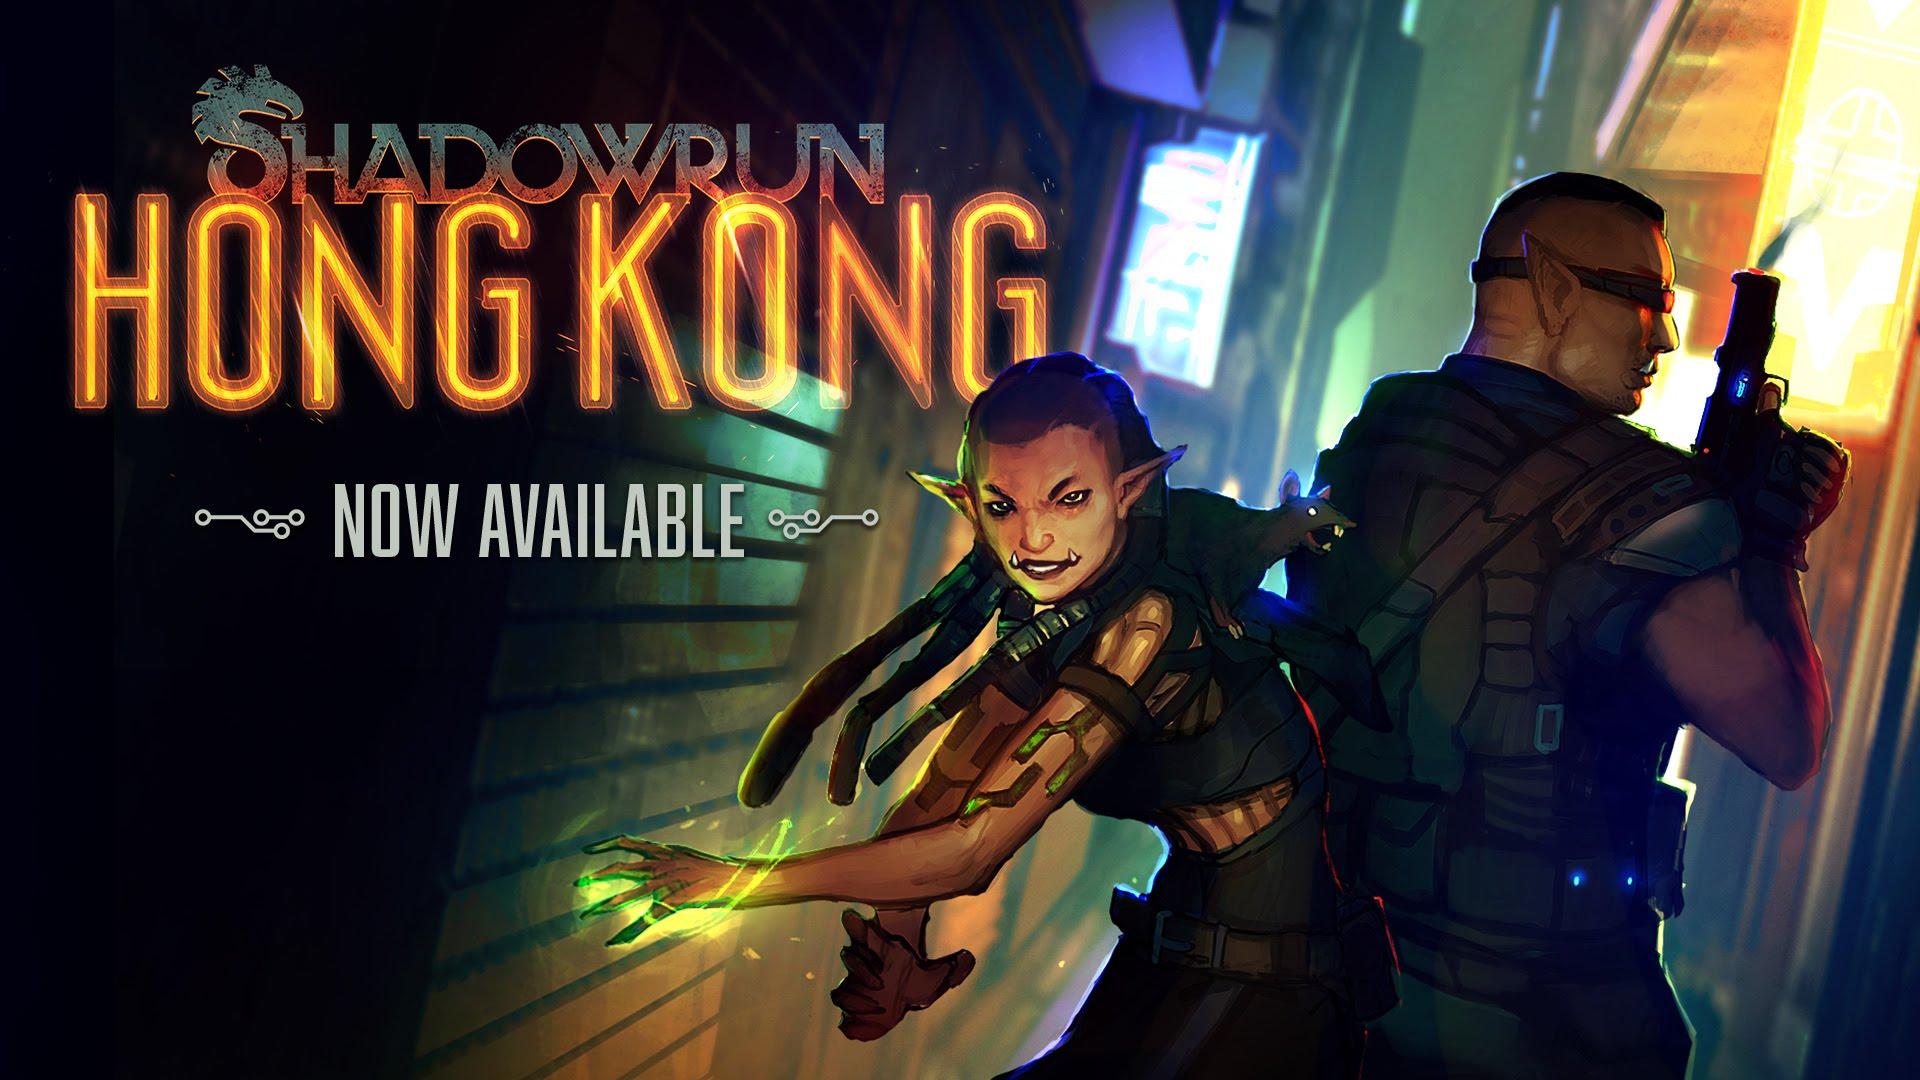 Hong kong free dating site